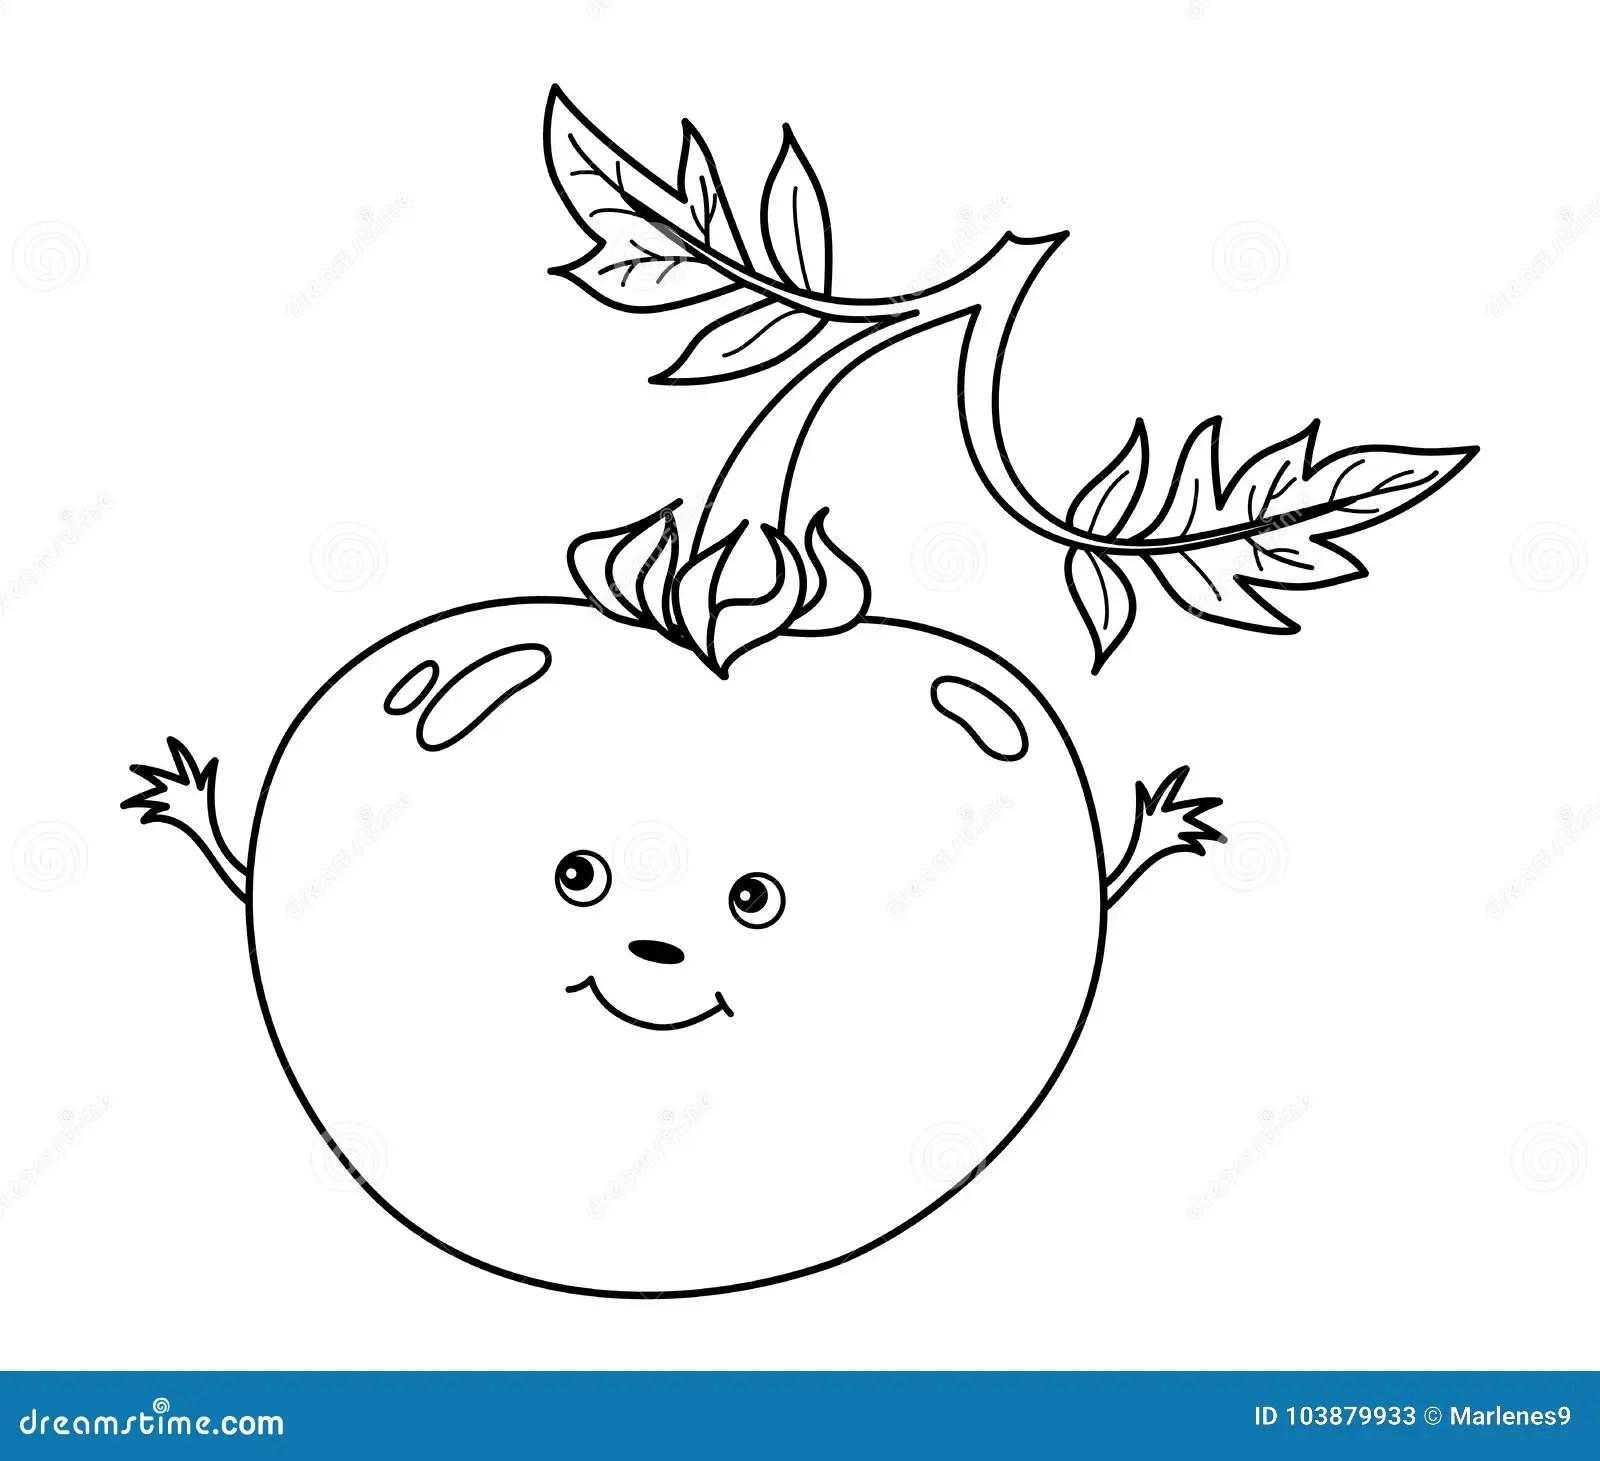 Vegetable Smiley Face Stock Illustrations 513 Vegetable